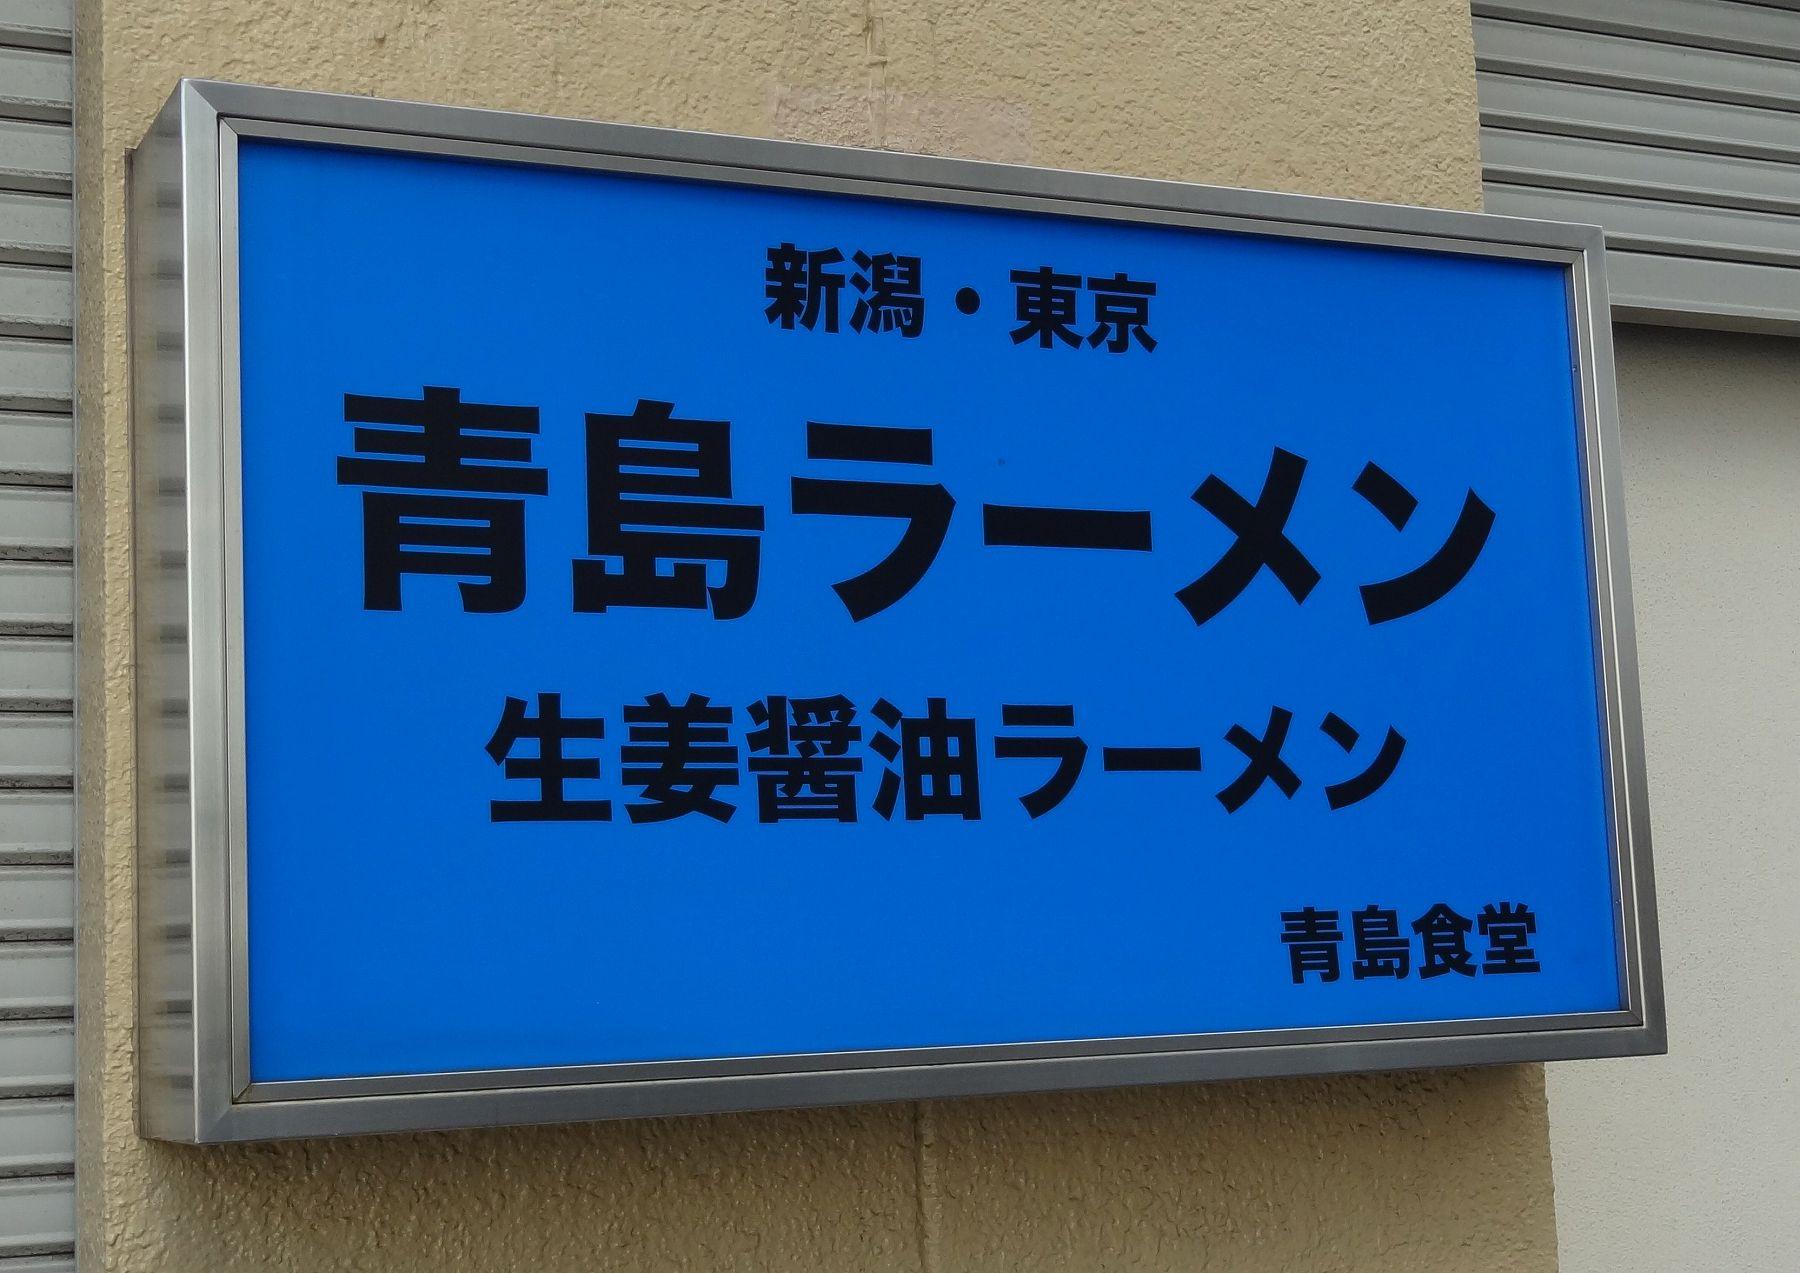 20121018001aoshima.jpg